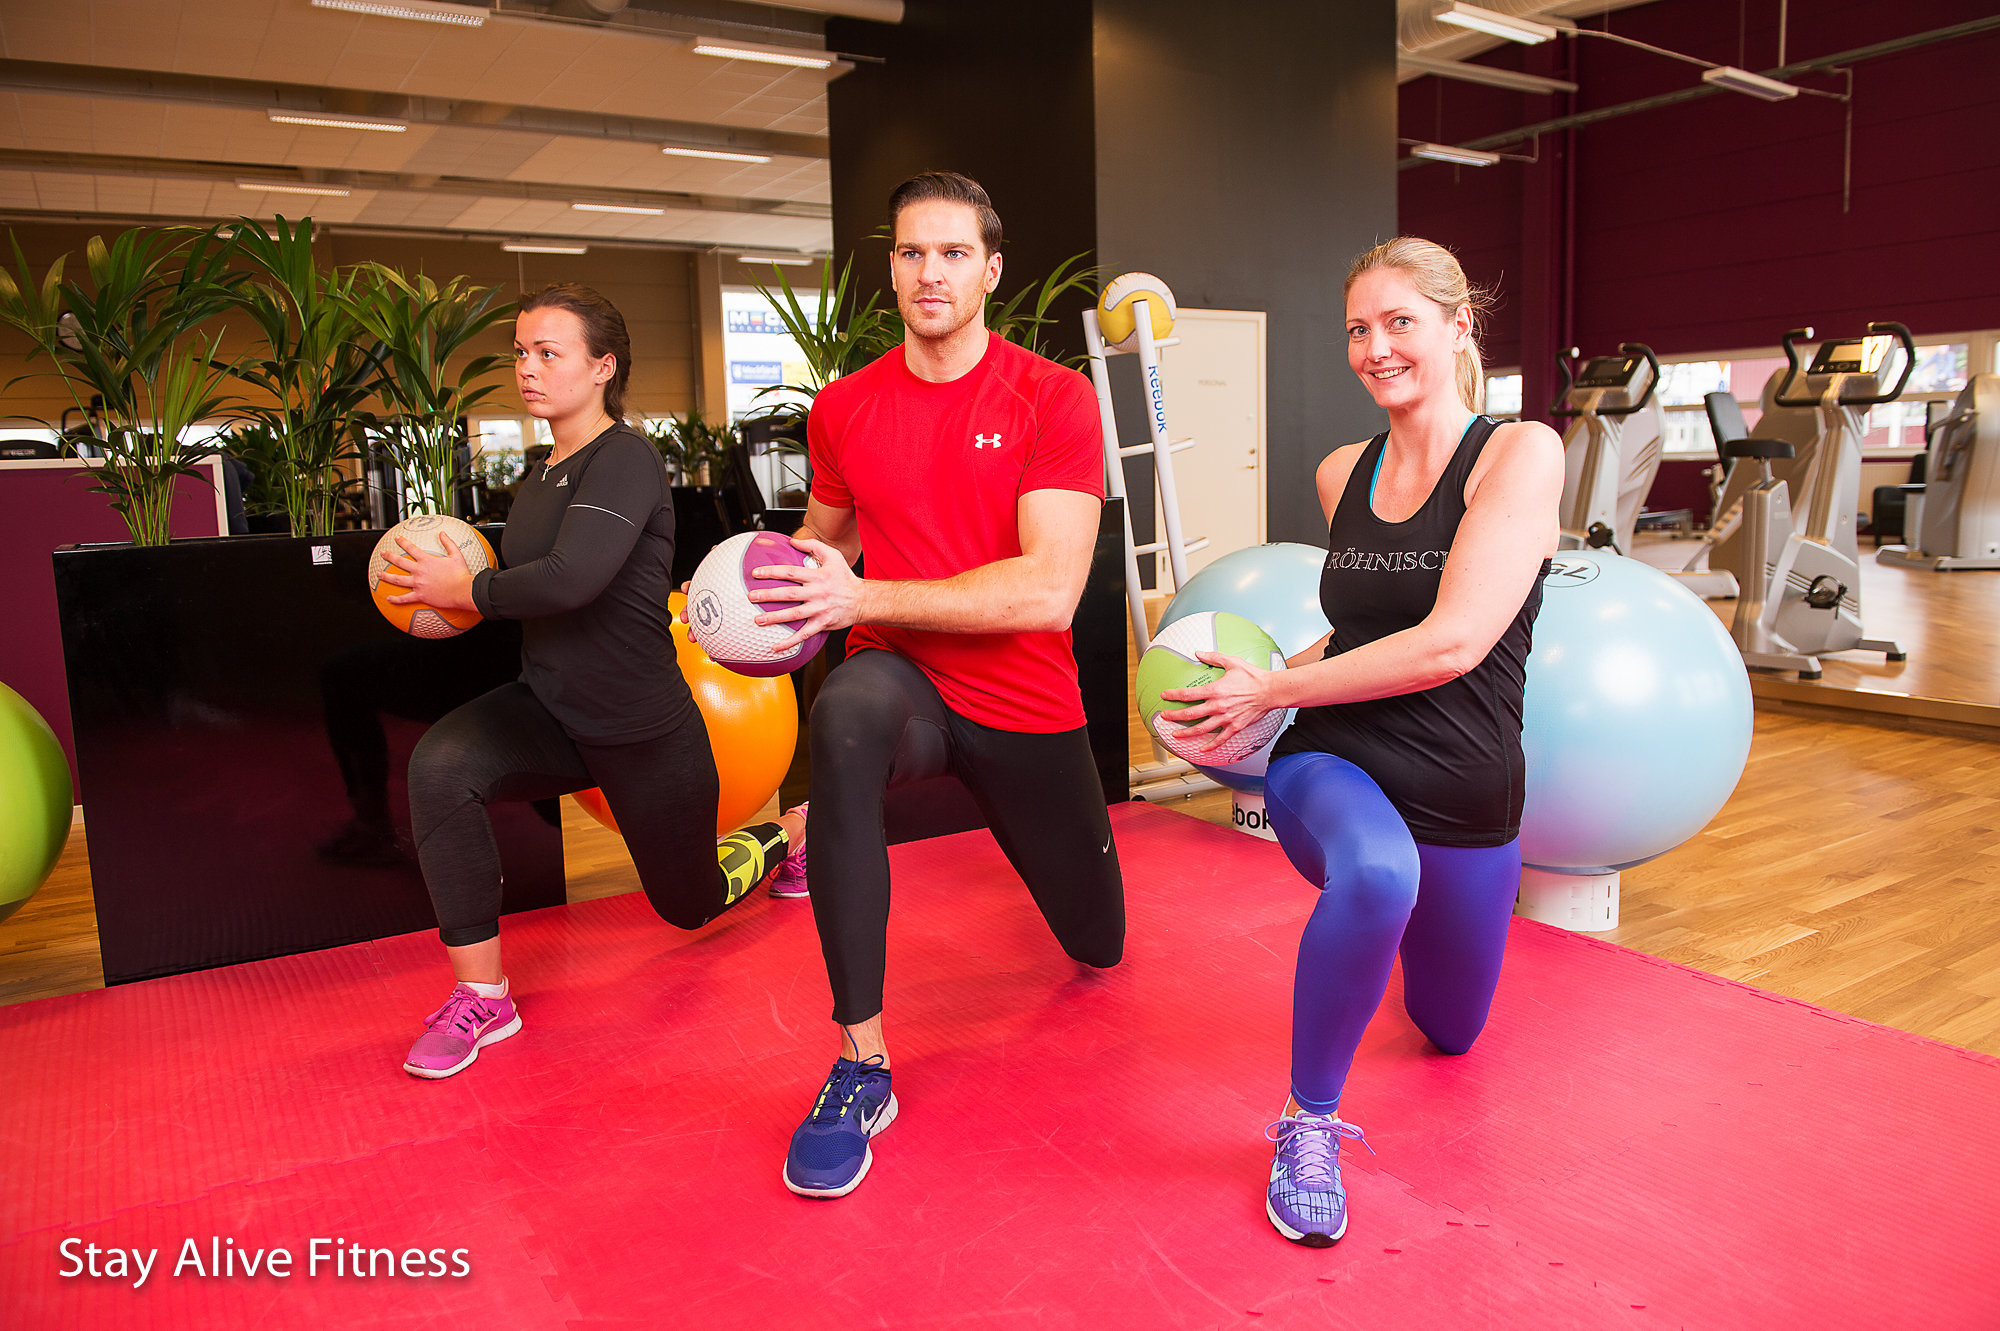 Group Training - stayalivefitness.se